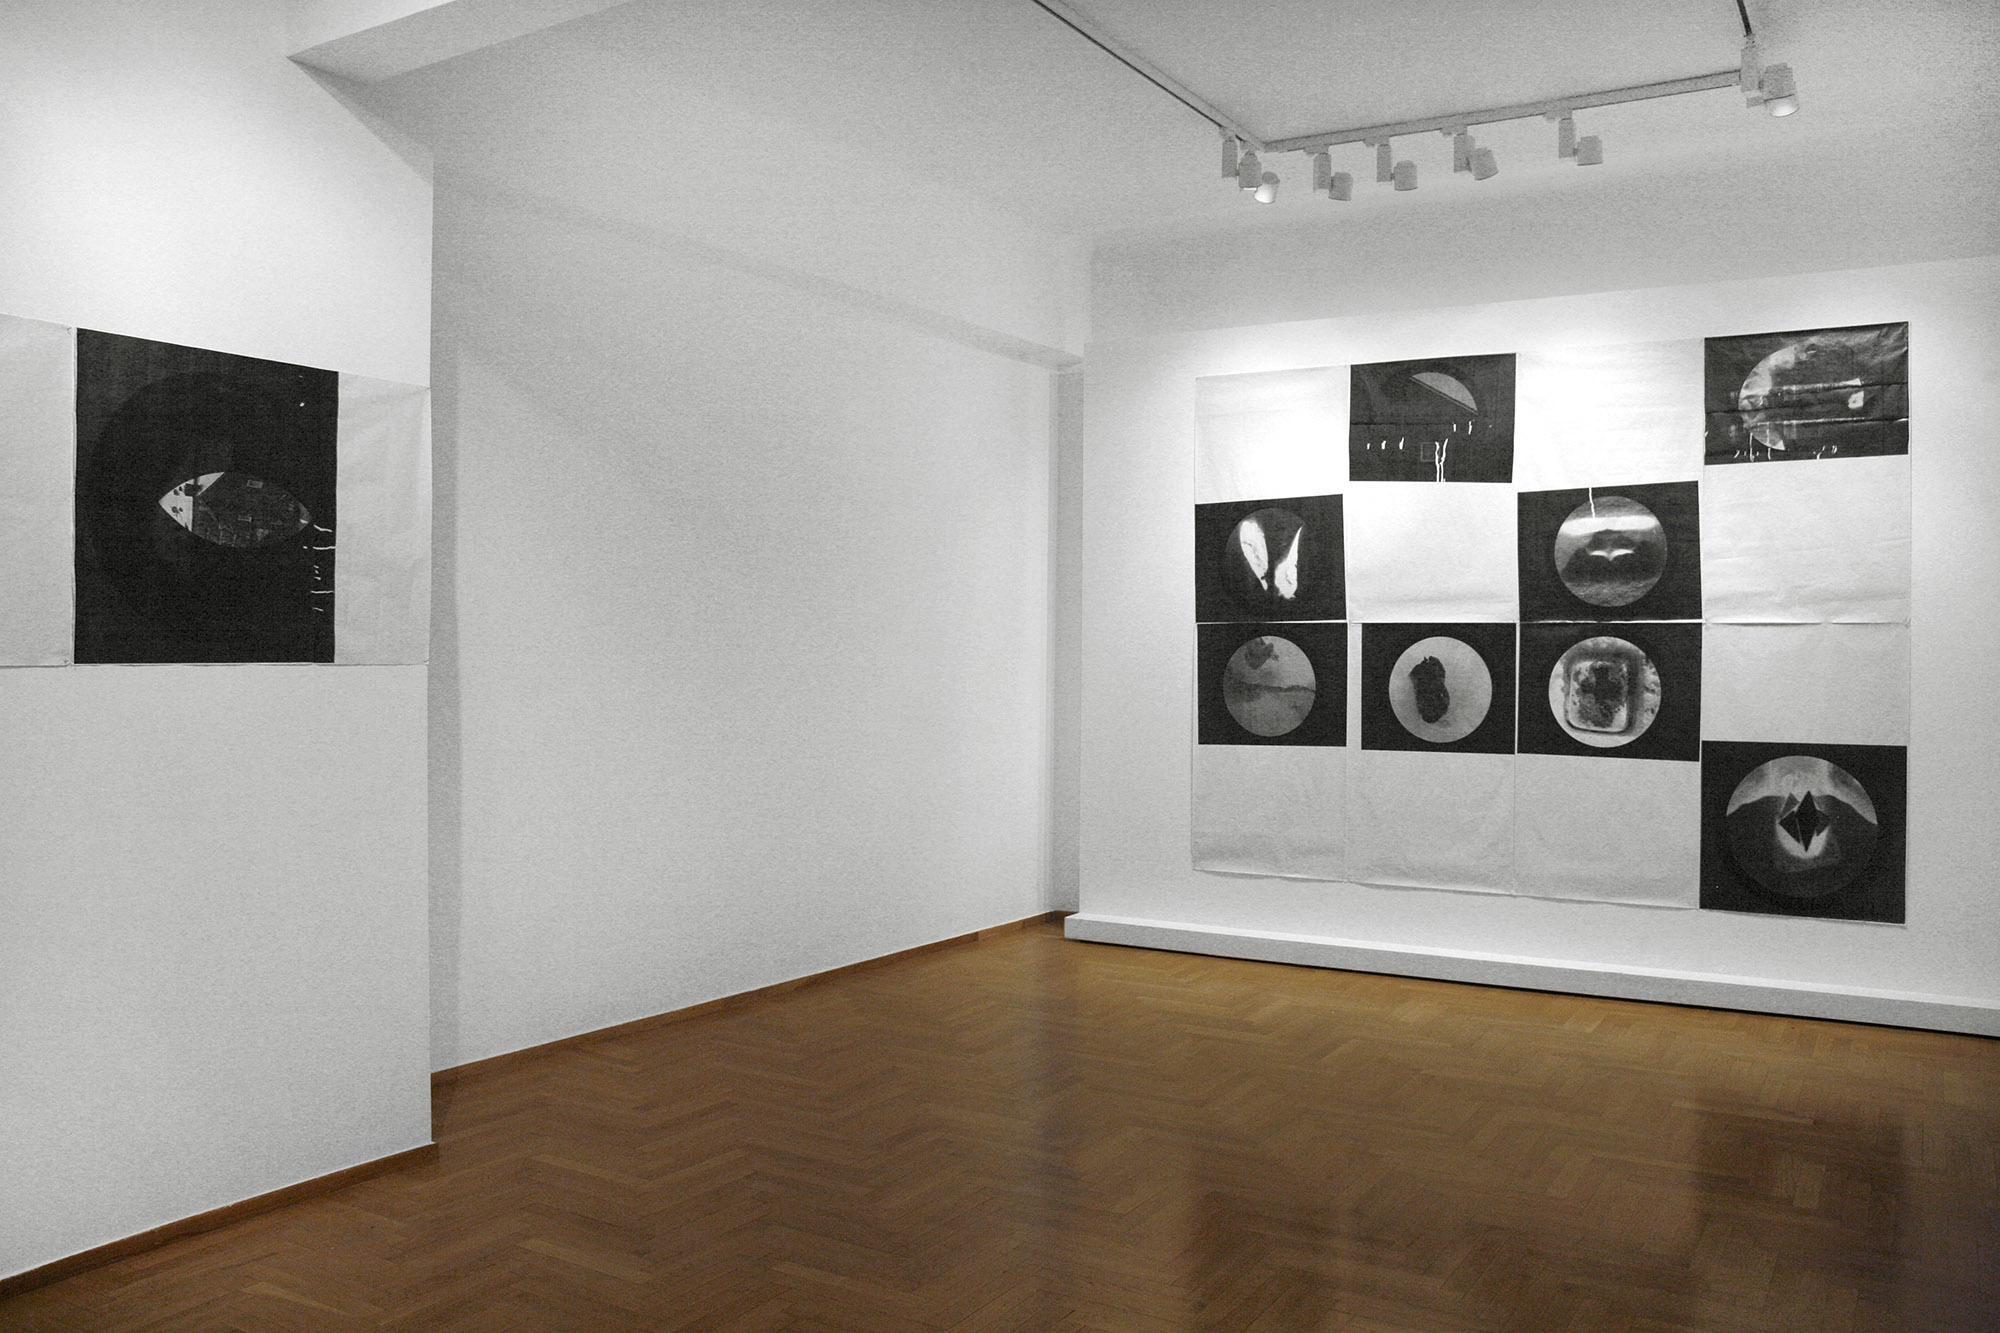 Ioanna Gouzeli / Spacesheep - Image 3